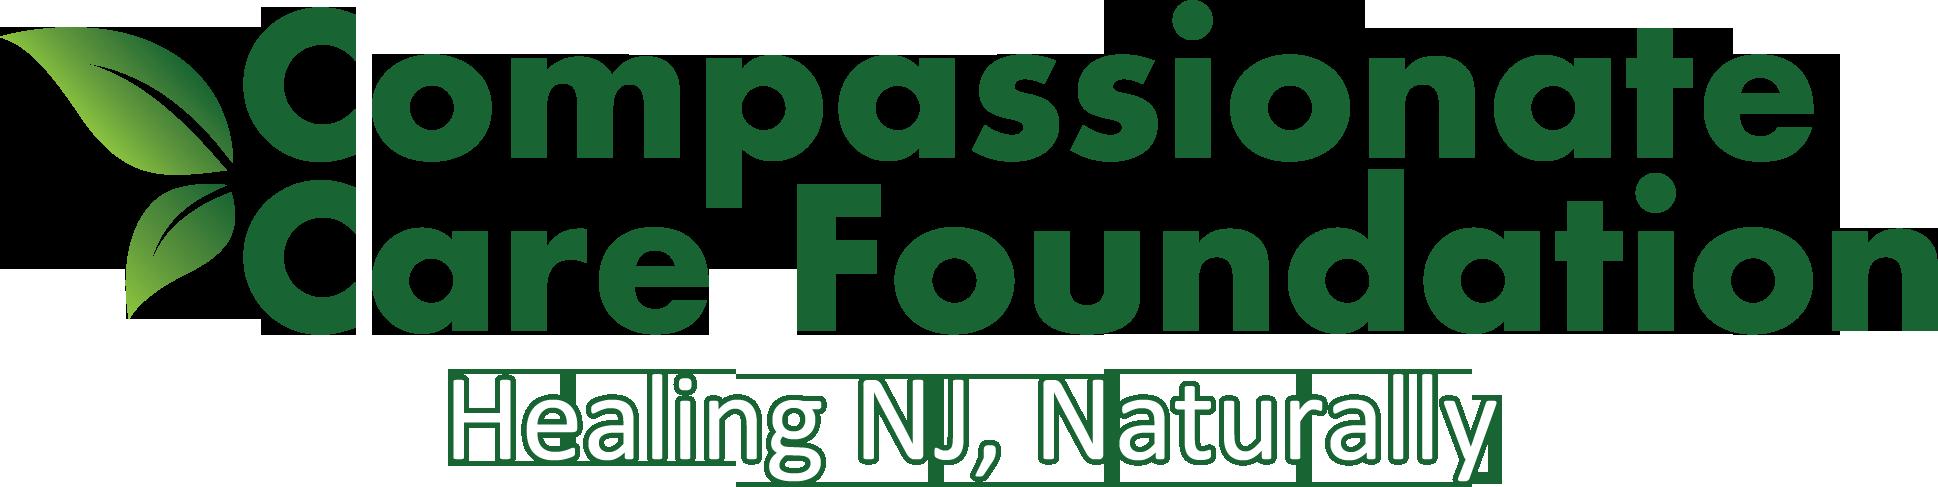 Compassionate Care Foundation, Inc.